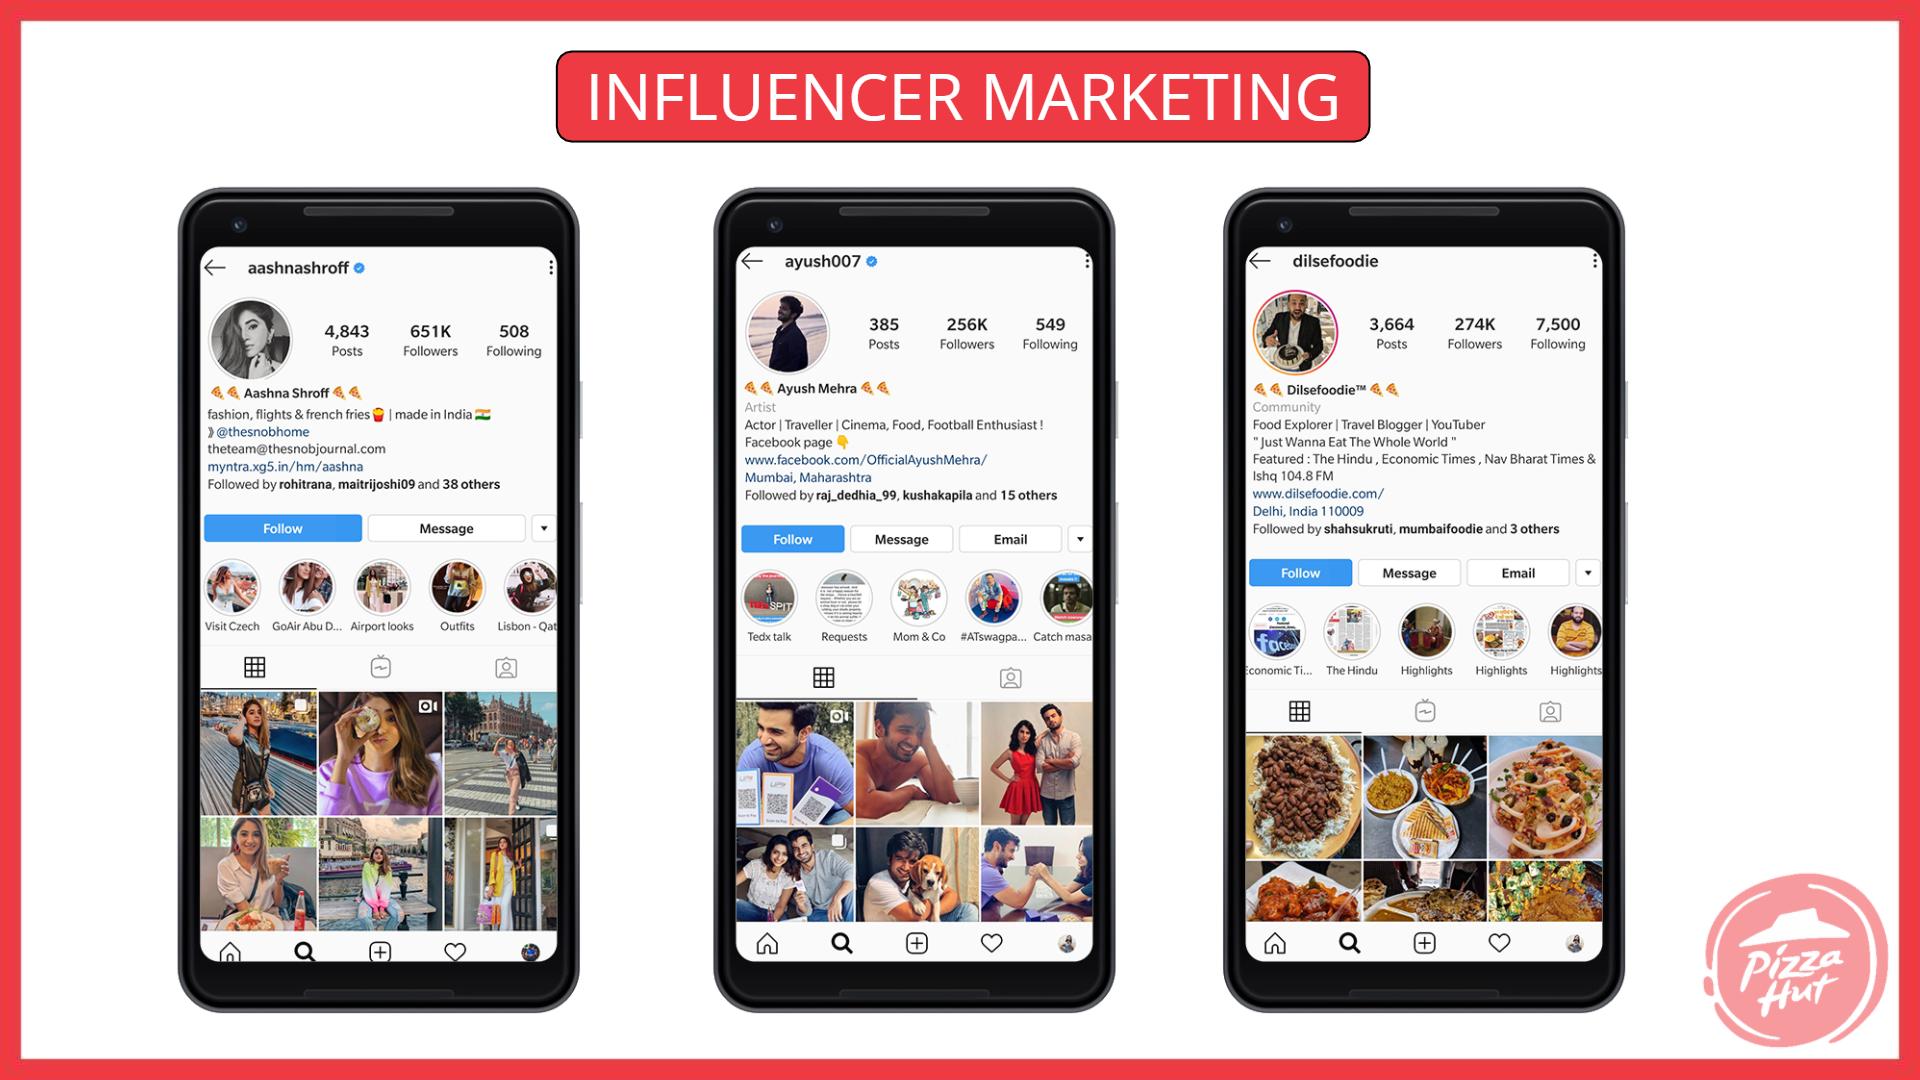 pizza hut marketing strategy Influencer Marketing 1 -Pizza Hut Marketing and Advertising Strategy